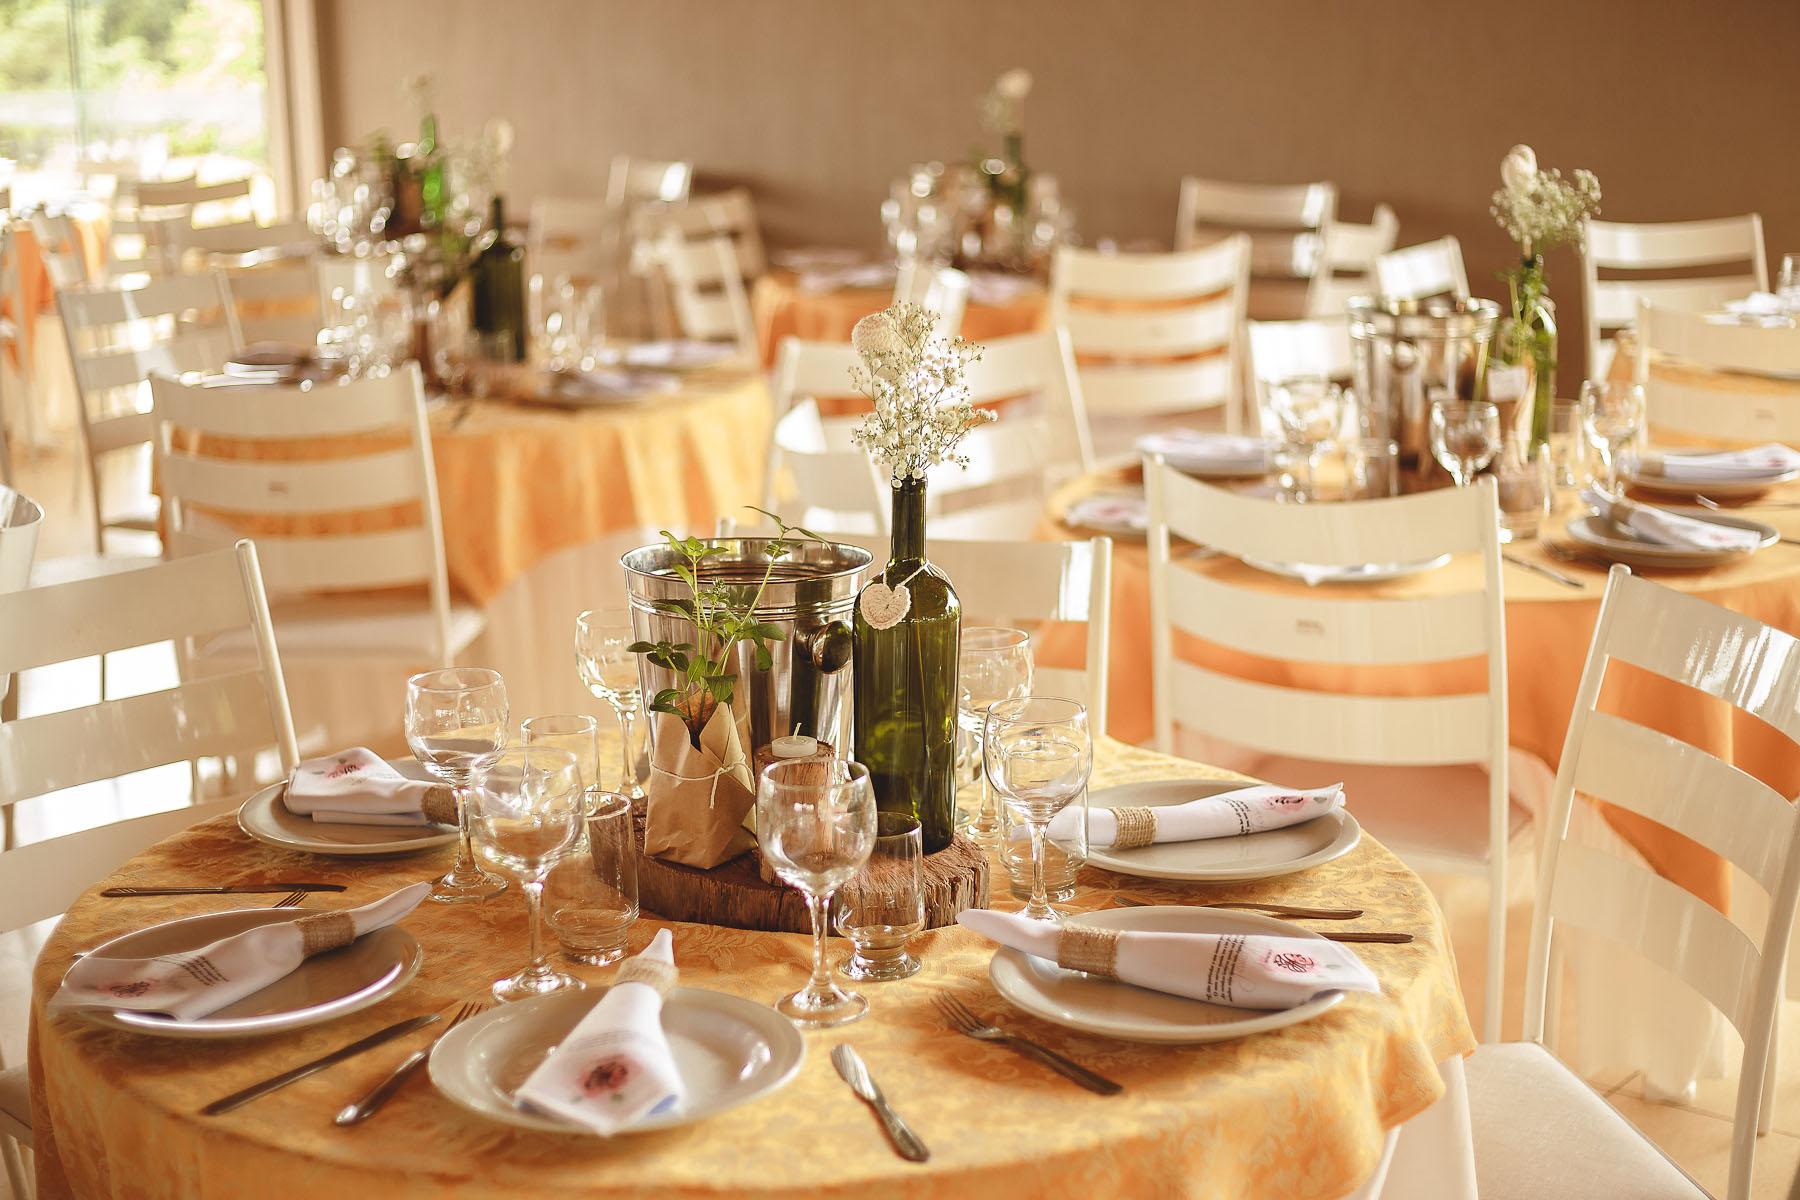 Casamento Rústico - Mesa dos Convidados